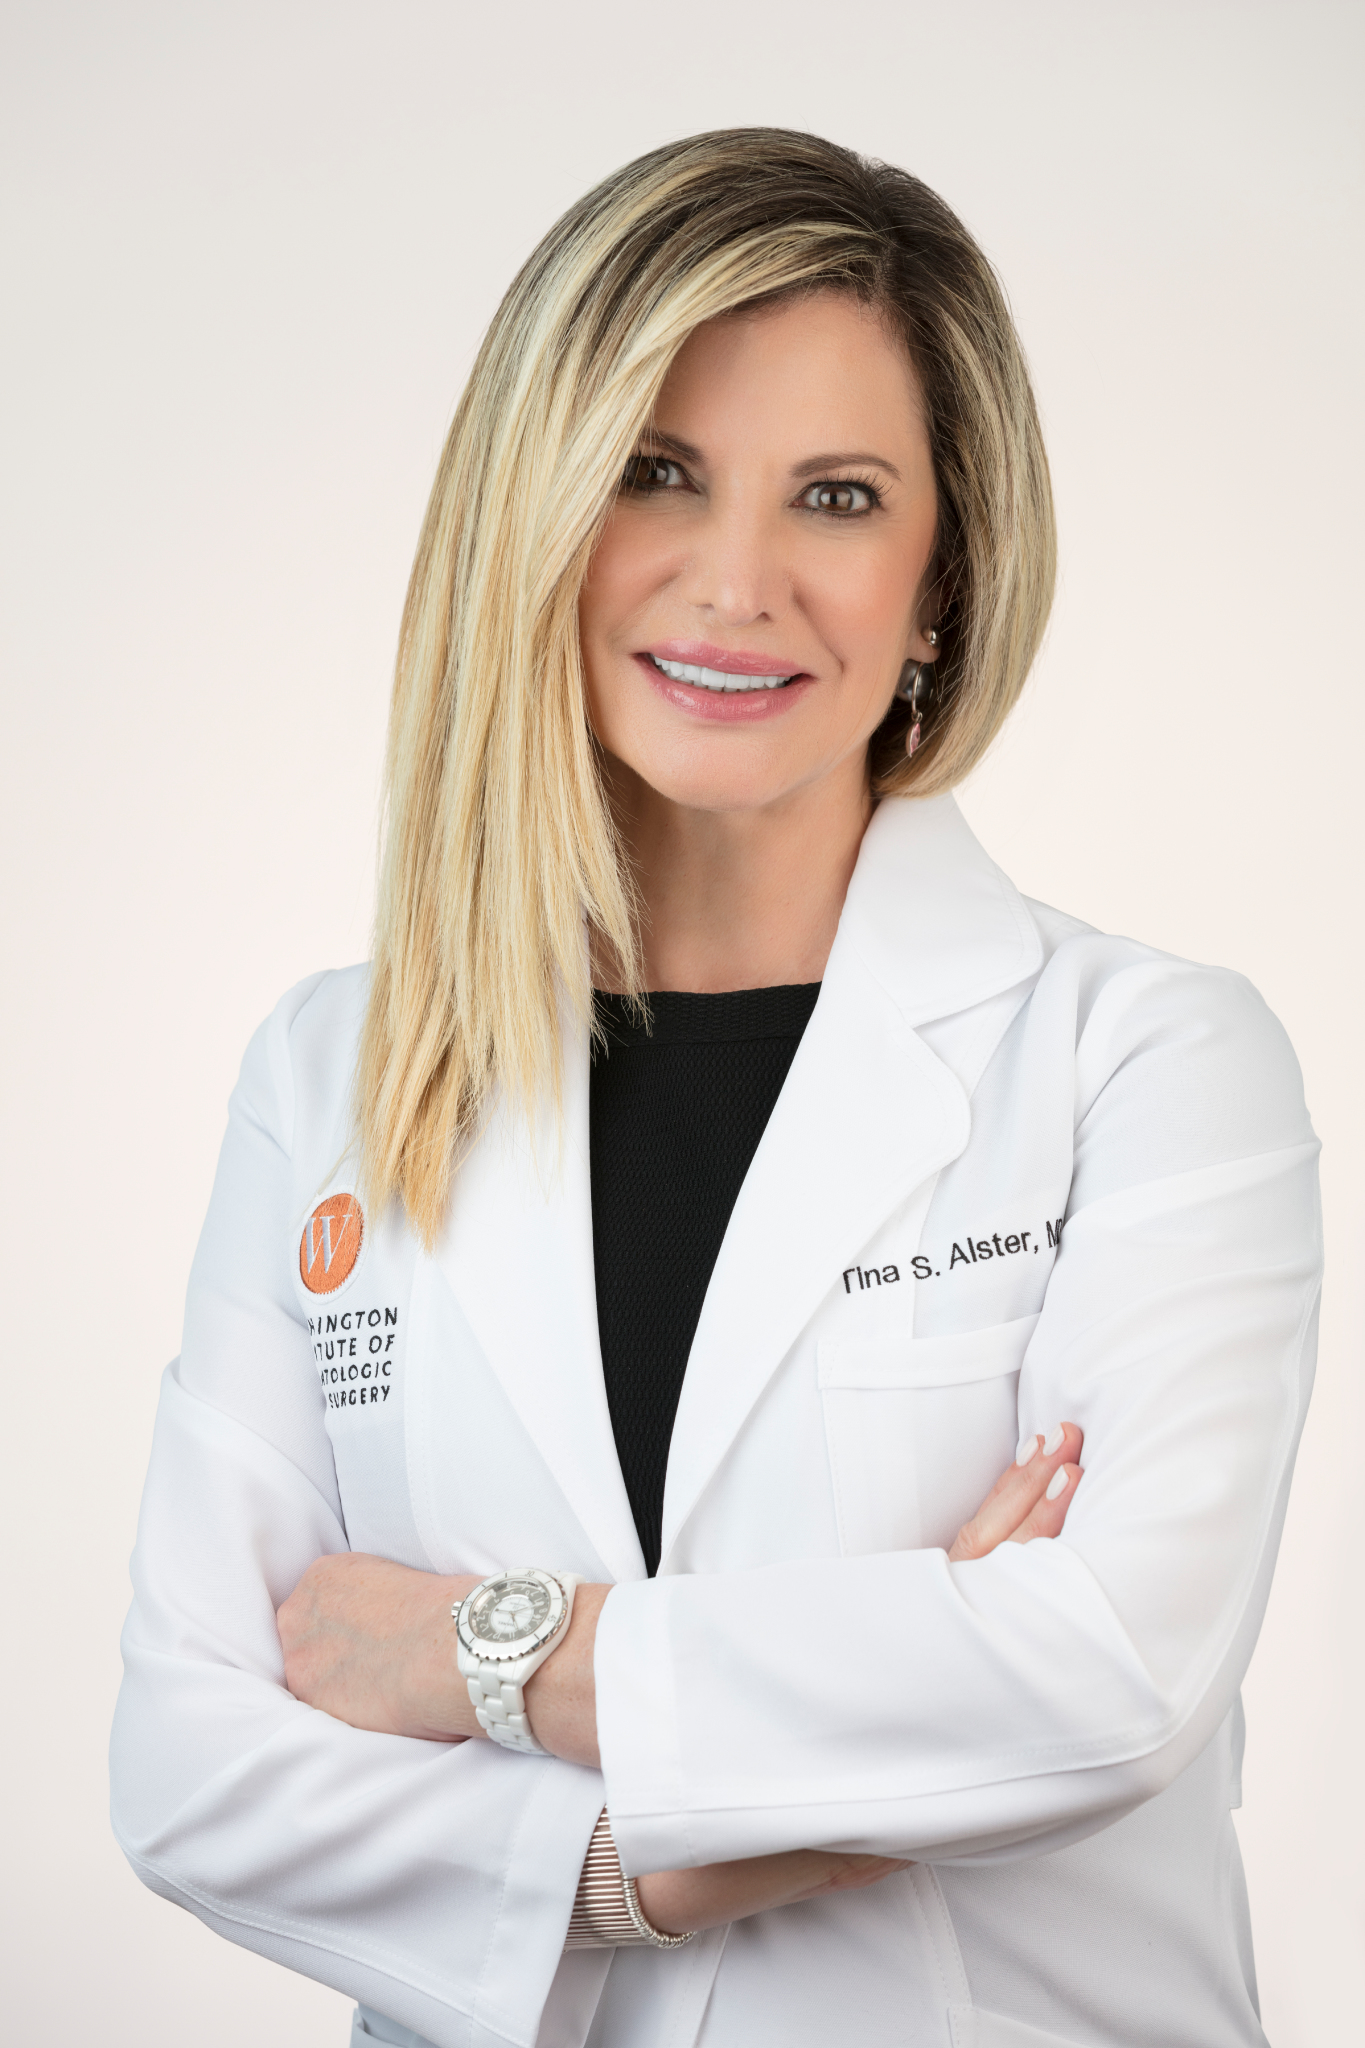 Tina Alster, MD